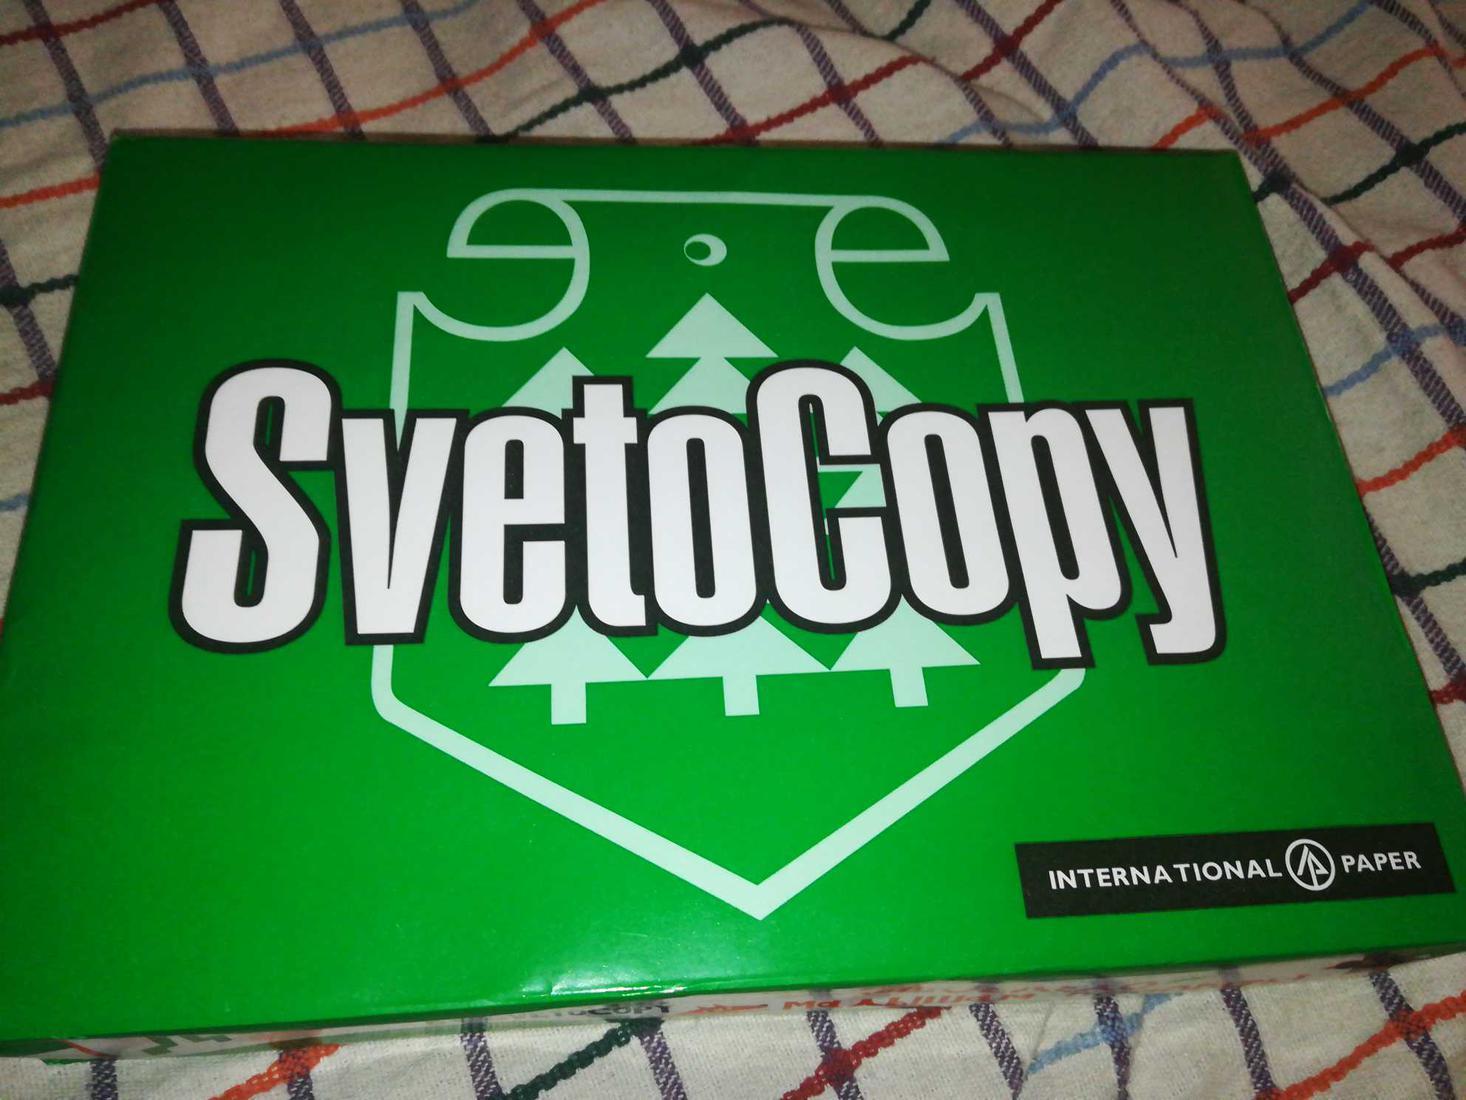 "цена Бумага ""SvetoCopy"" белая А4 80гр/м2, 500 листов"